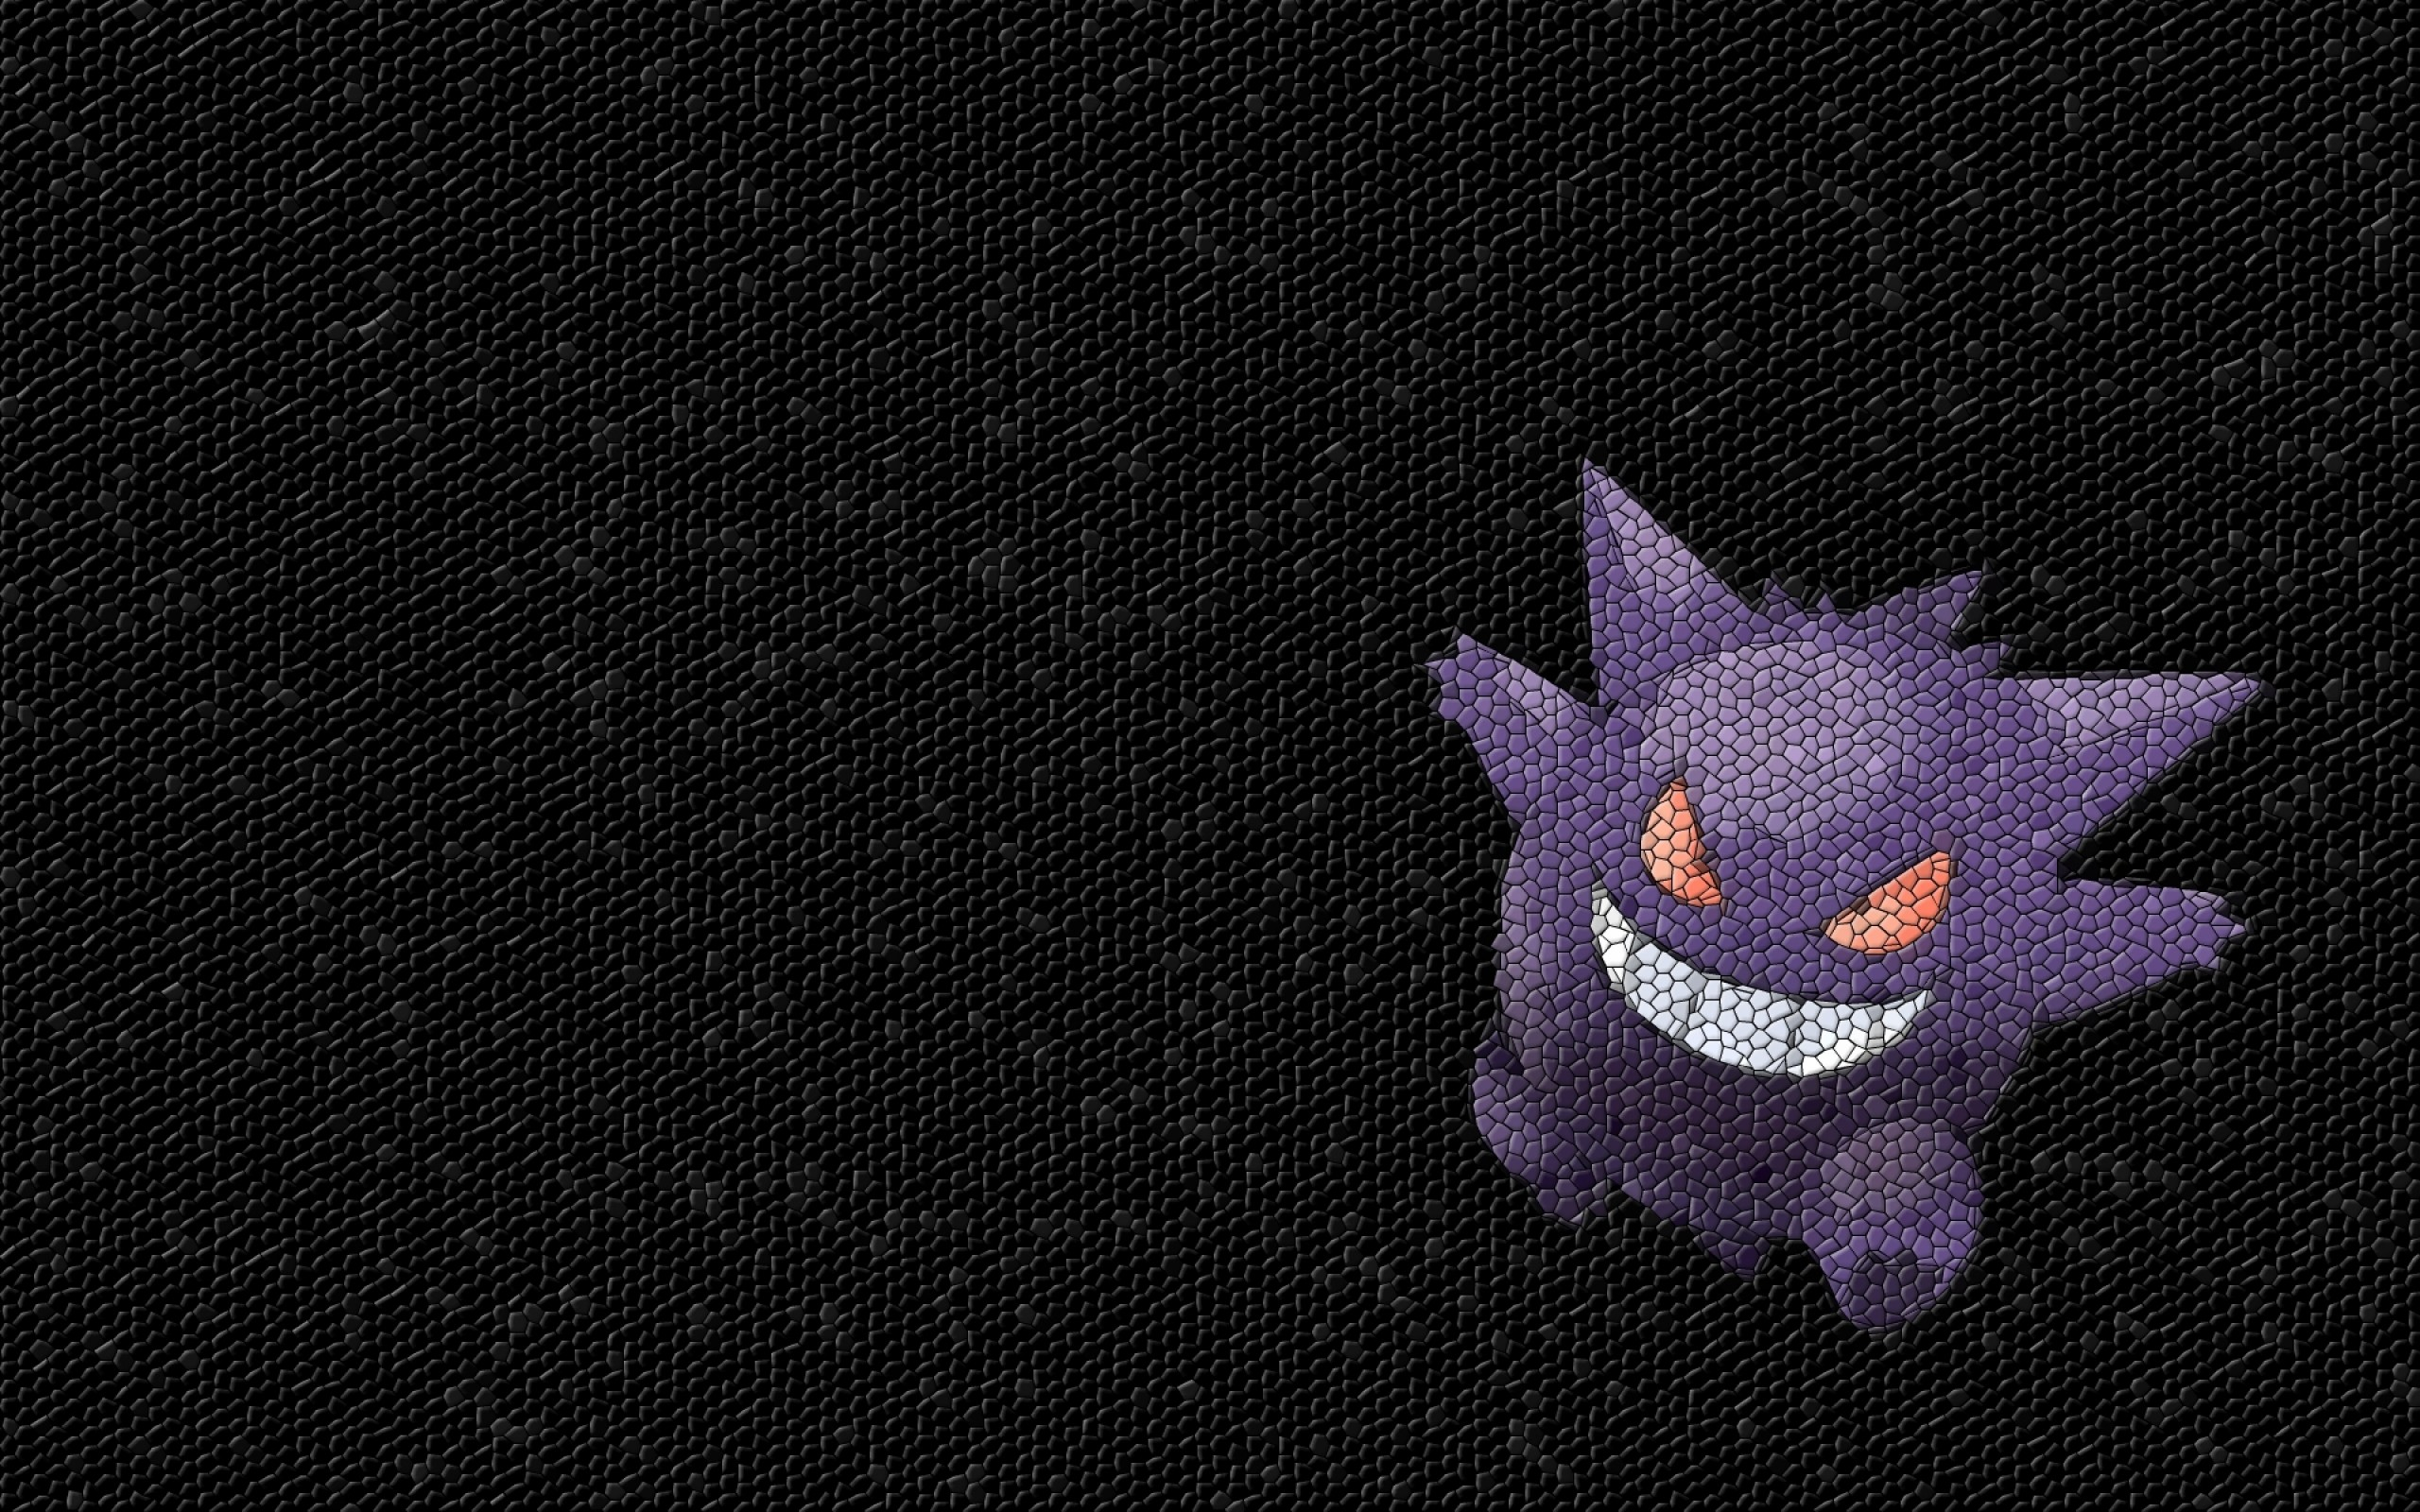 pokemon gengar mosaic 1920×1200 wallpaper Art HD Wallpaper